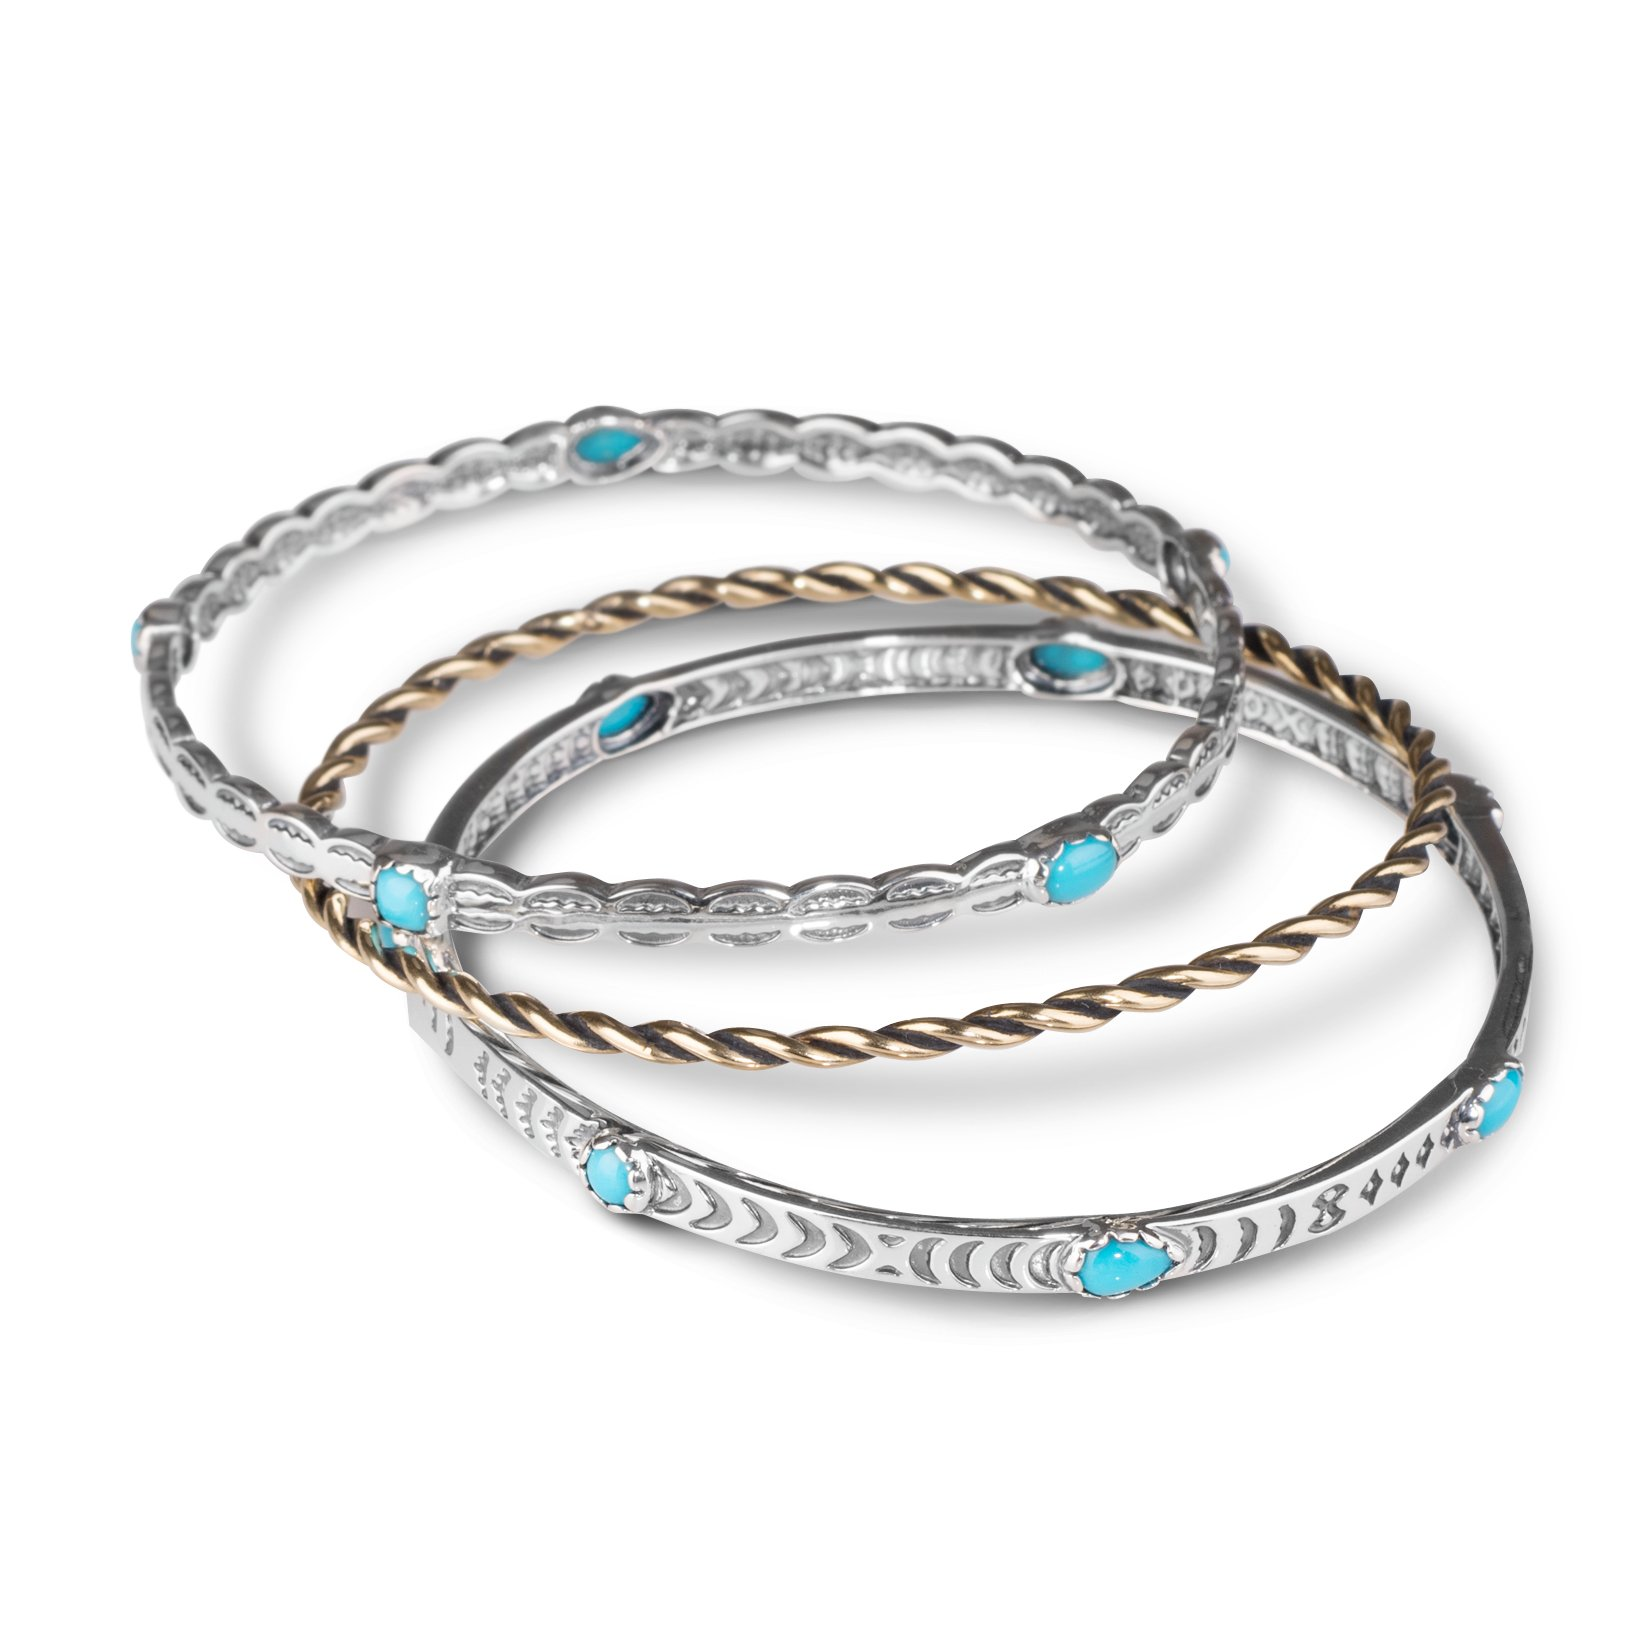 American West Sleeping Beauty Turquoise Set of 3 Bangle Bracelets